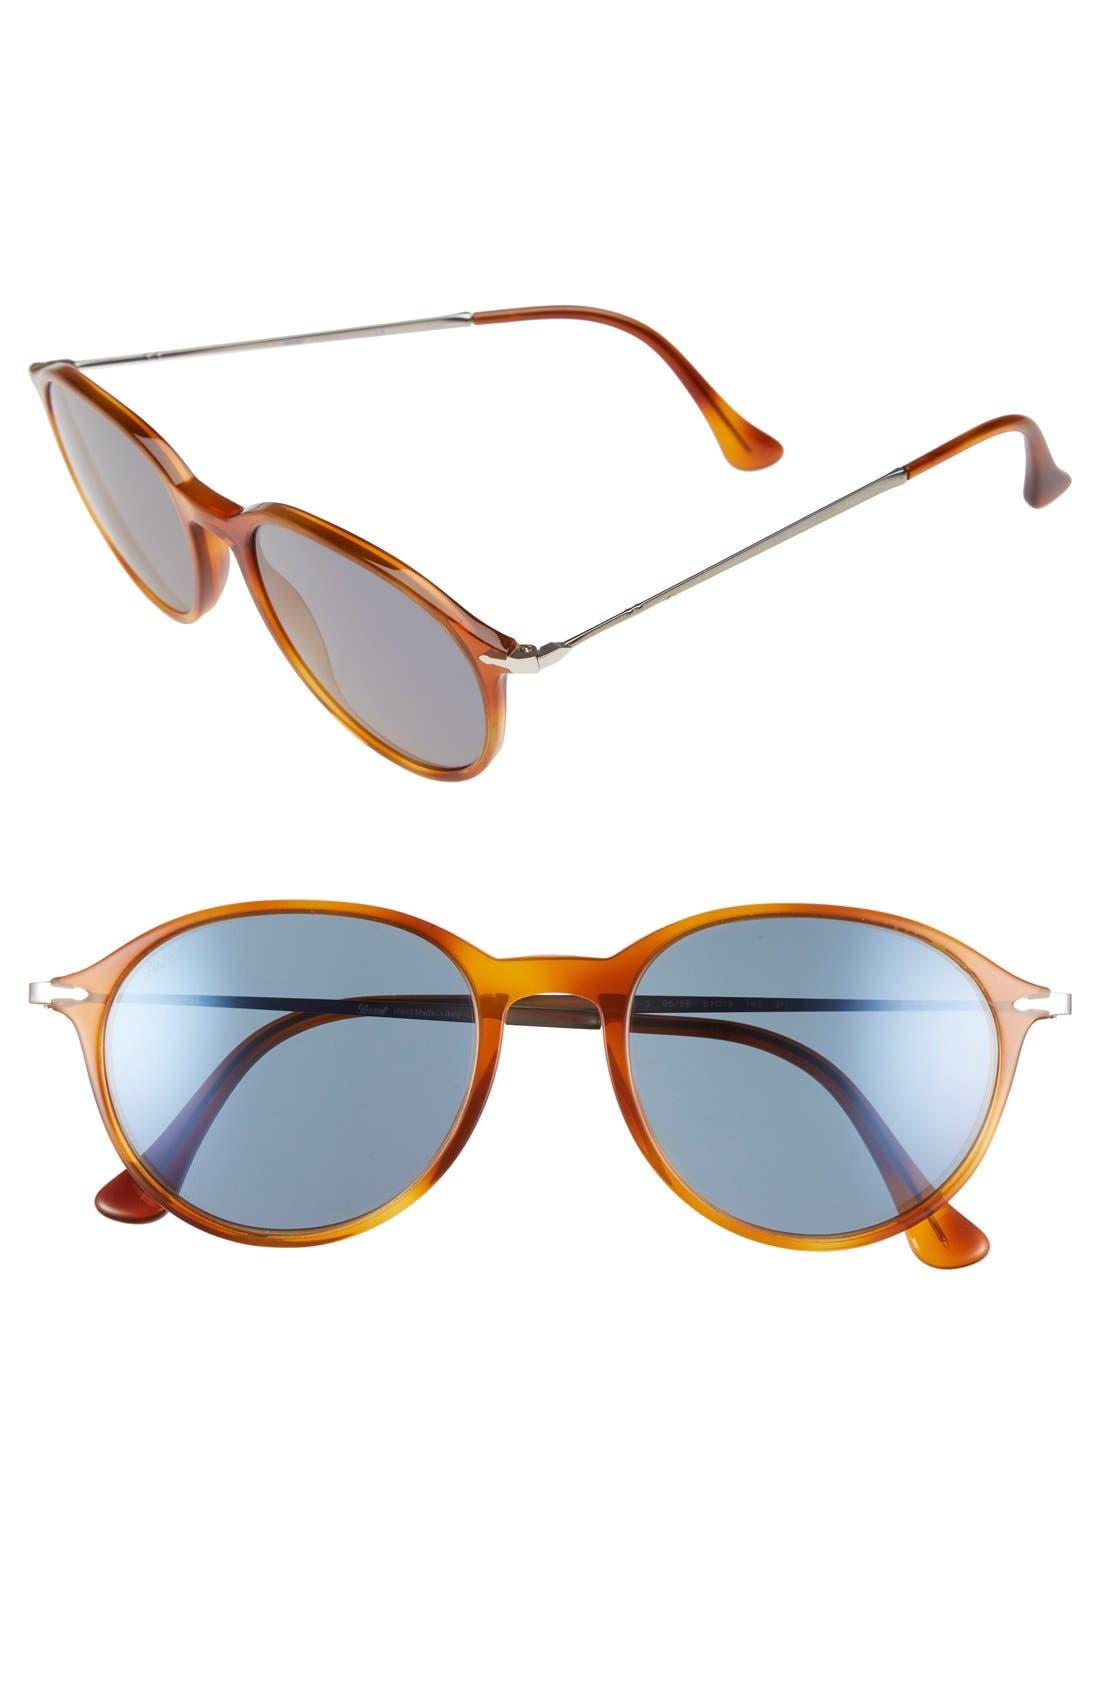 51mm Sunglasses,                             Main thumbnail 1, color,                             235